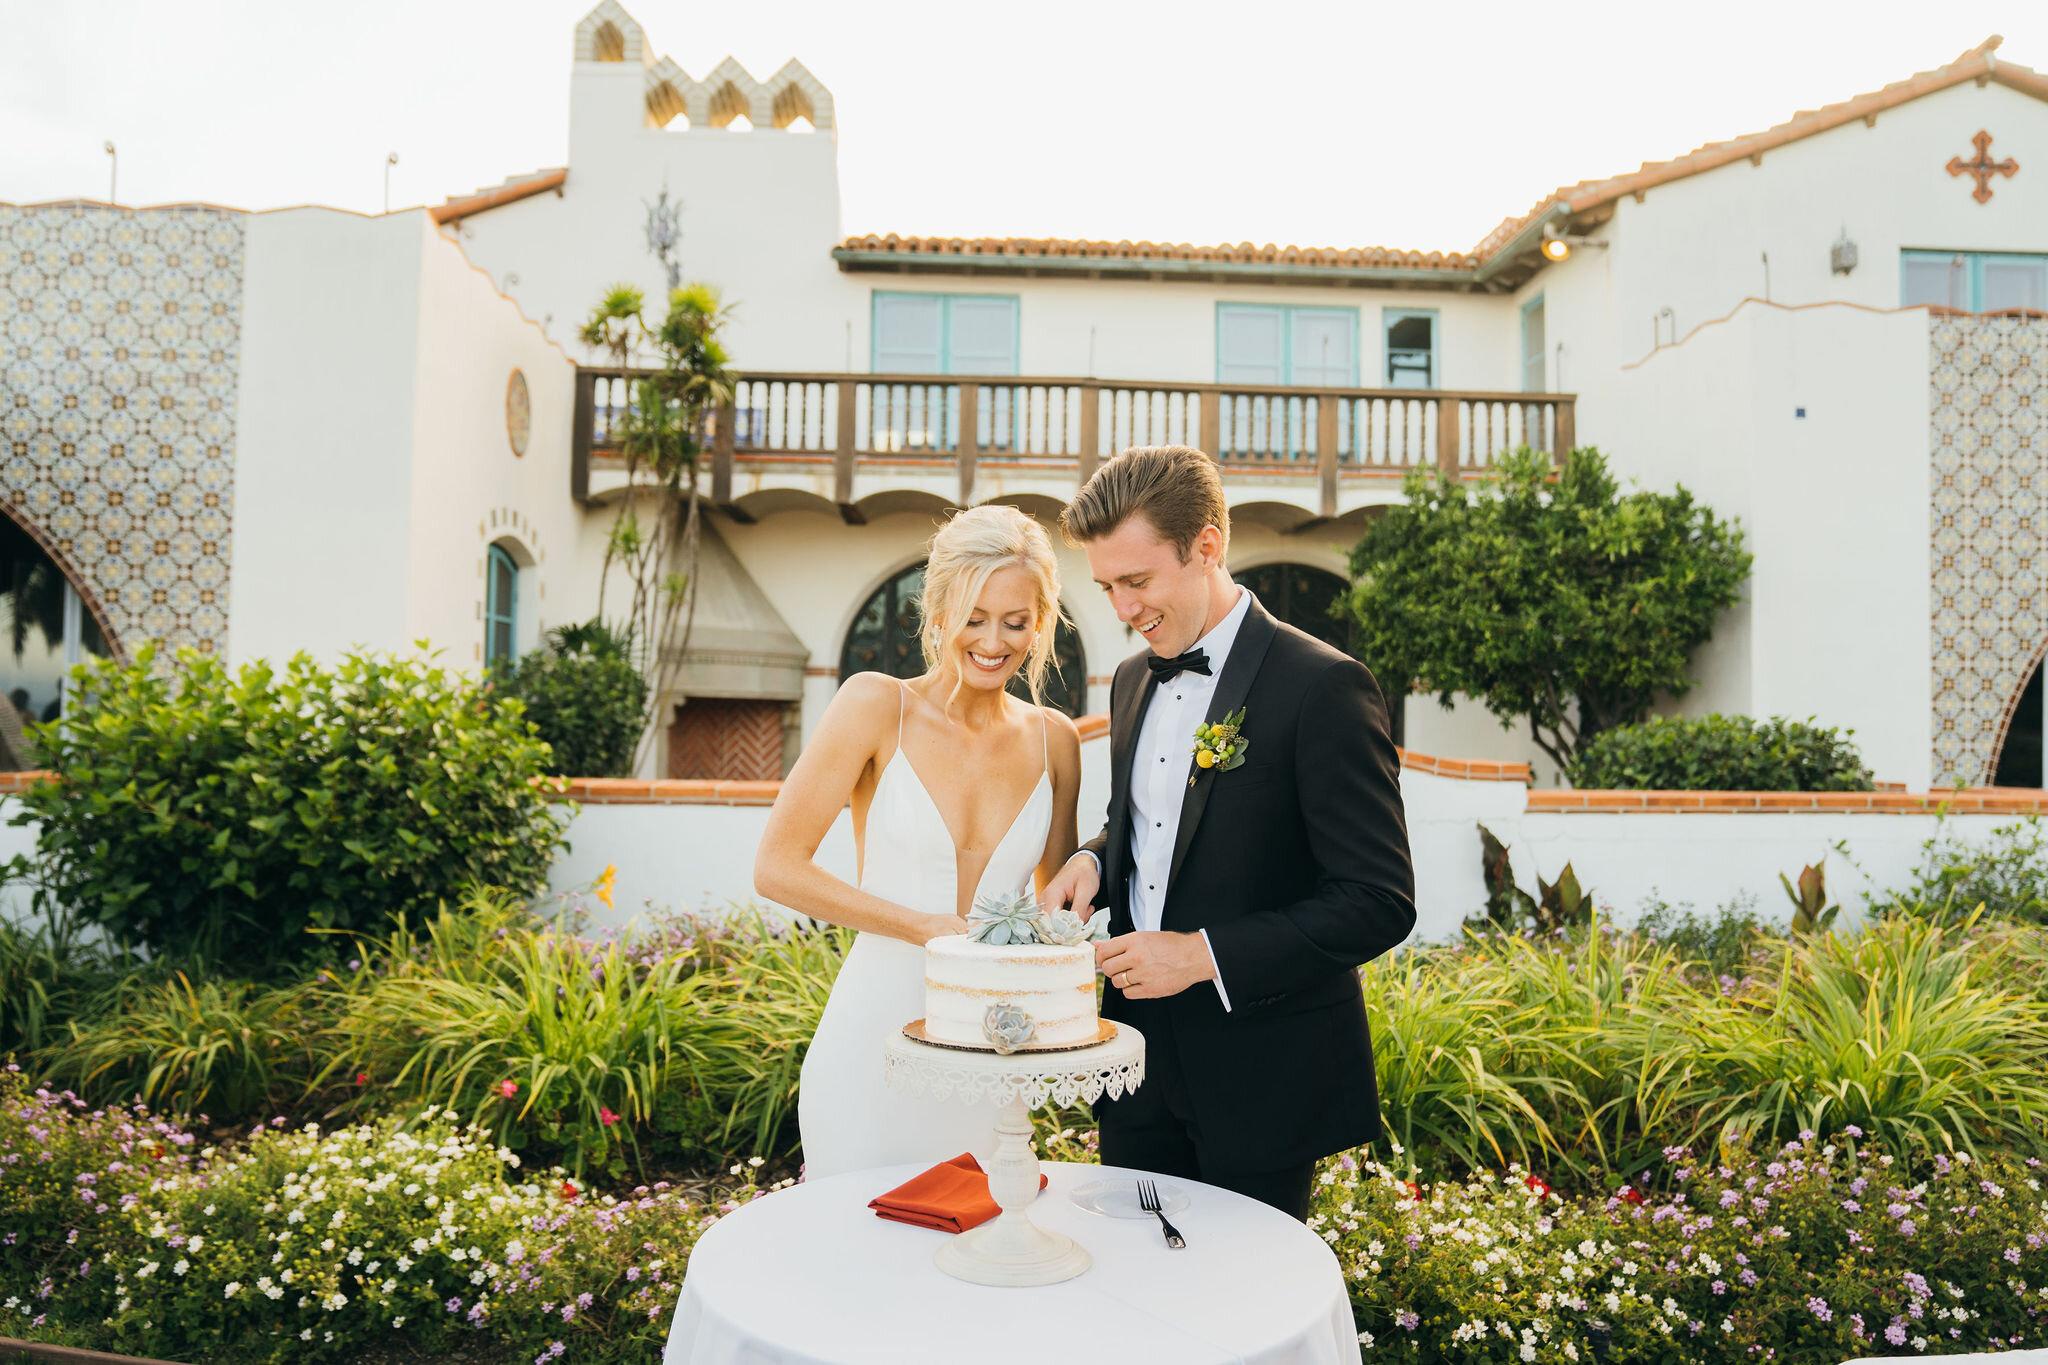 adamson-house-wedding-photography-165.jpg